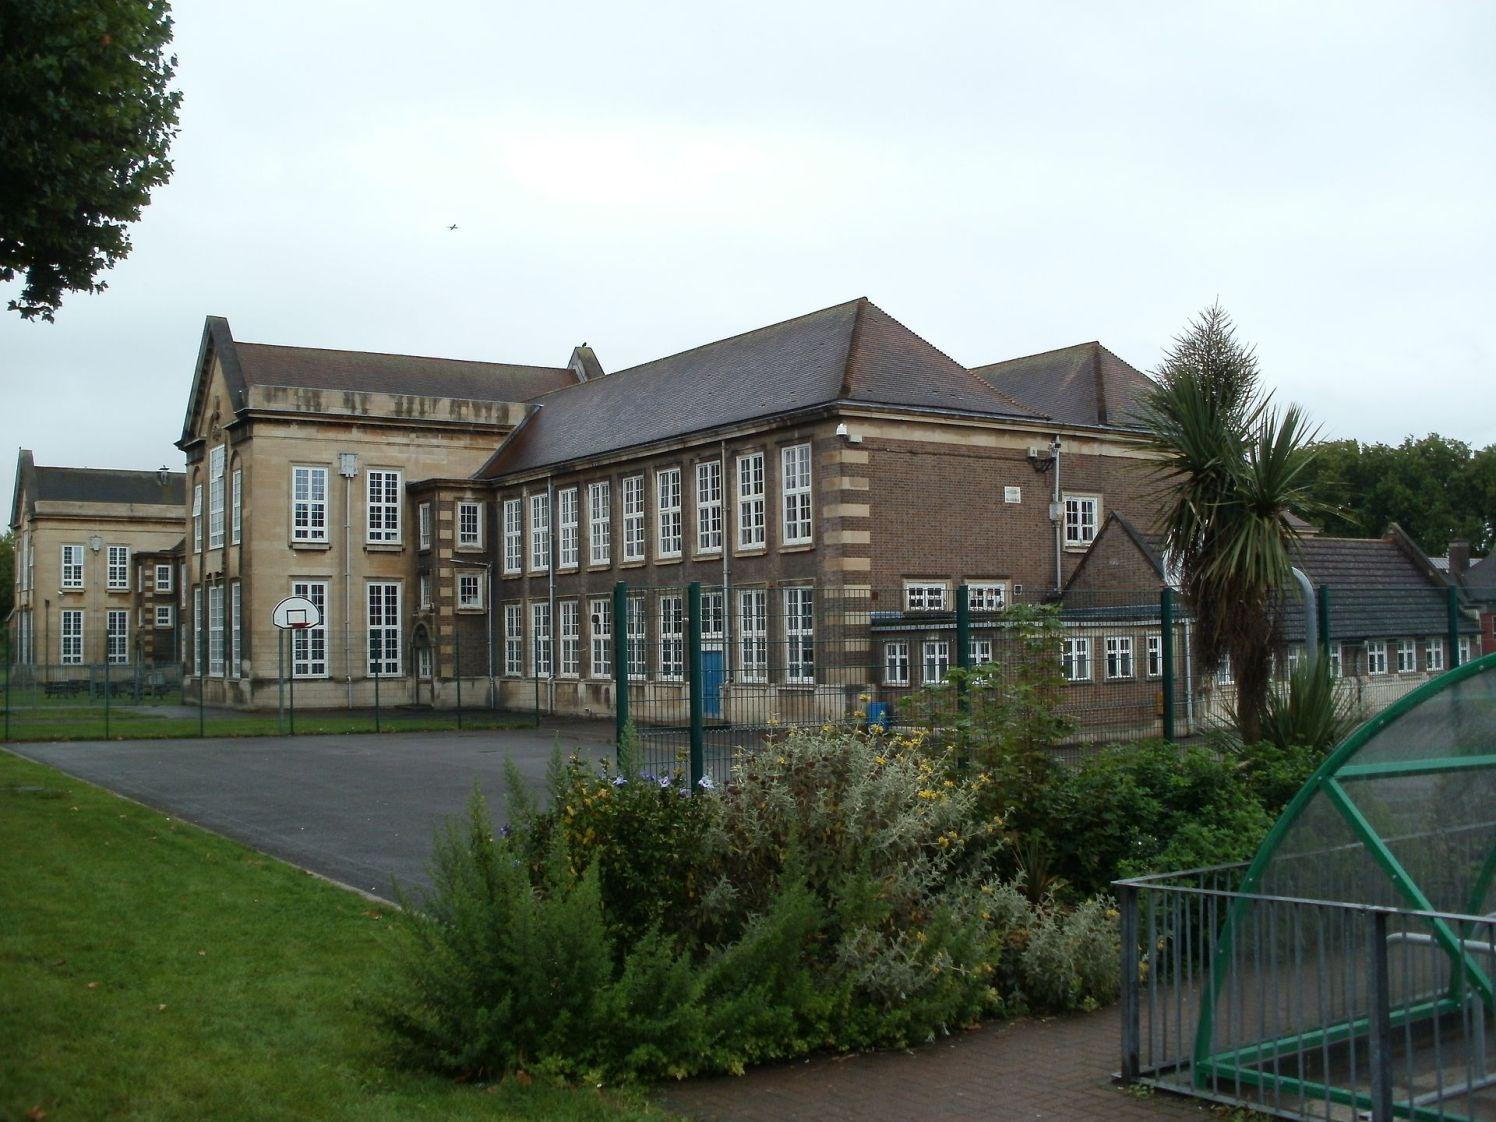 Chiswick_Community_School_-_London_-_20110904b